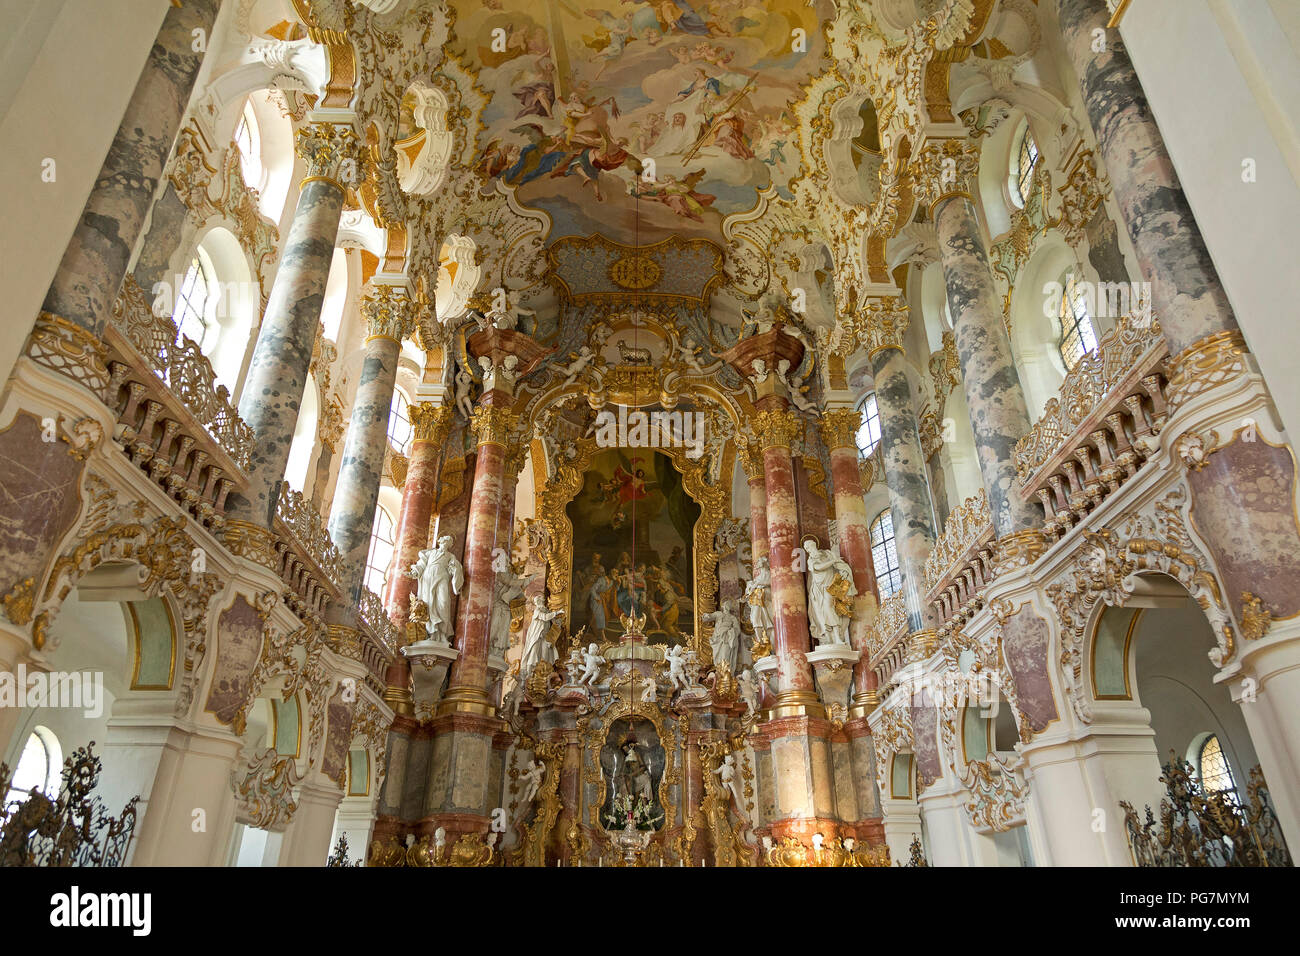 chancel, Wieskirche (Pilgrimmage Church of Wies) near Steingaden, Allgaeu, Bavaria, Germany - Stock Image